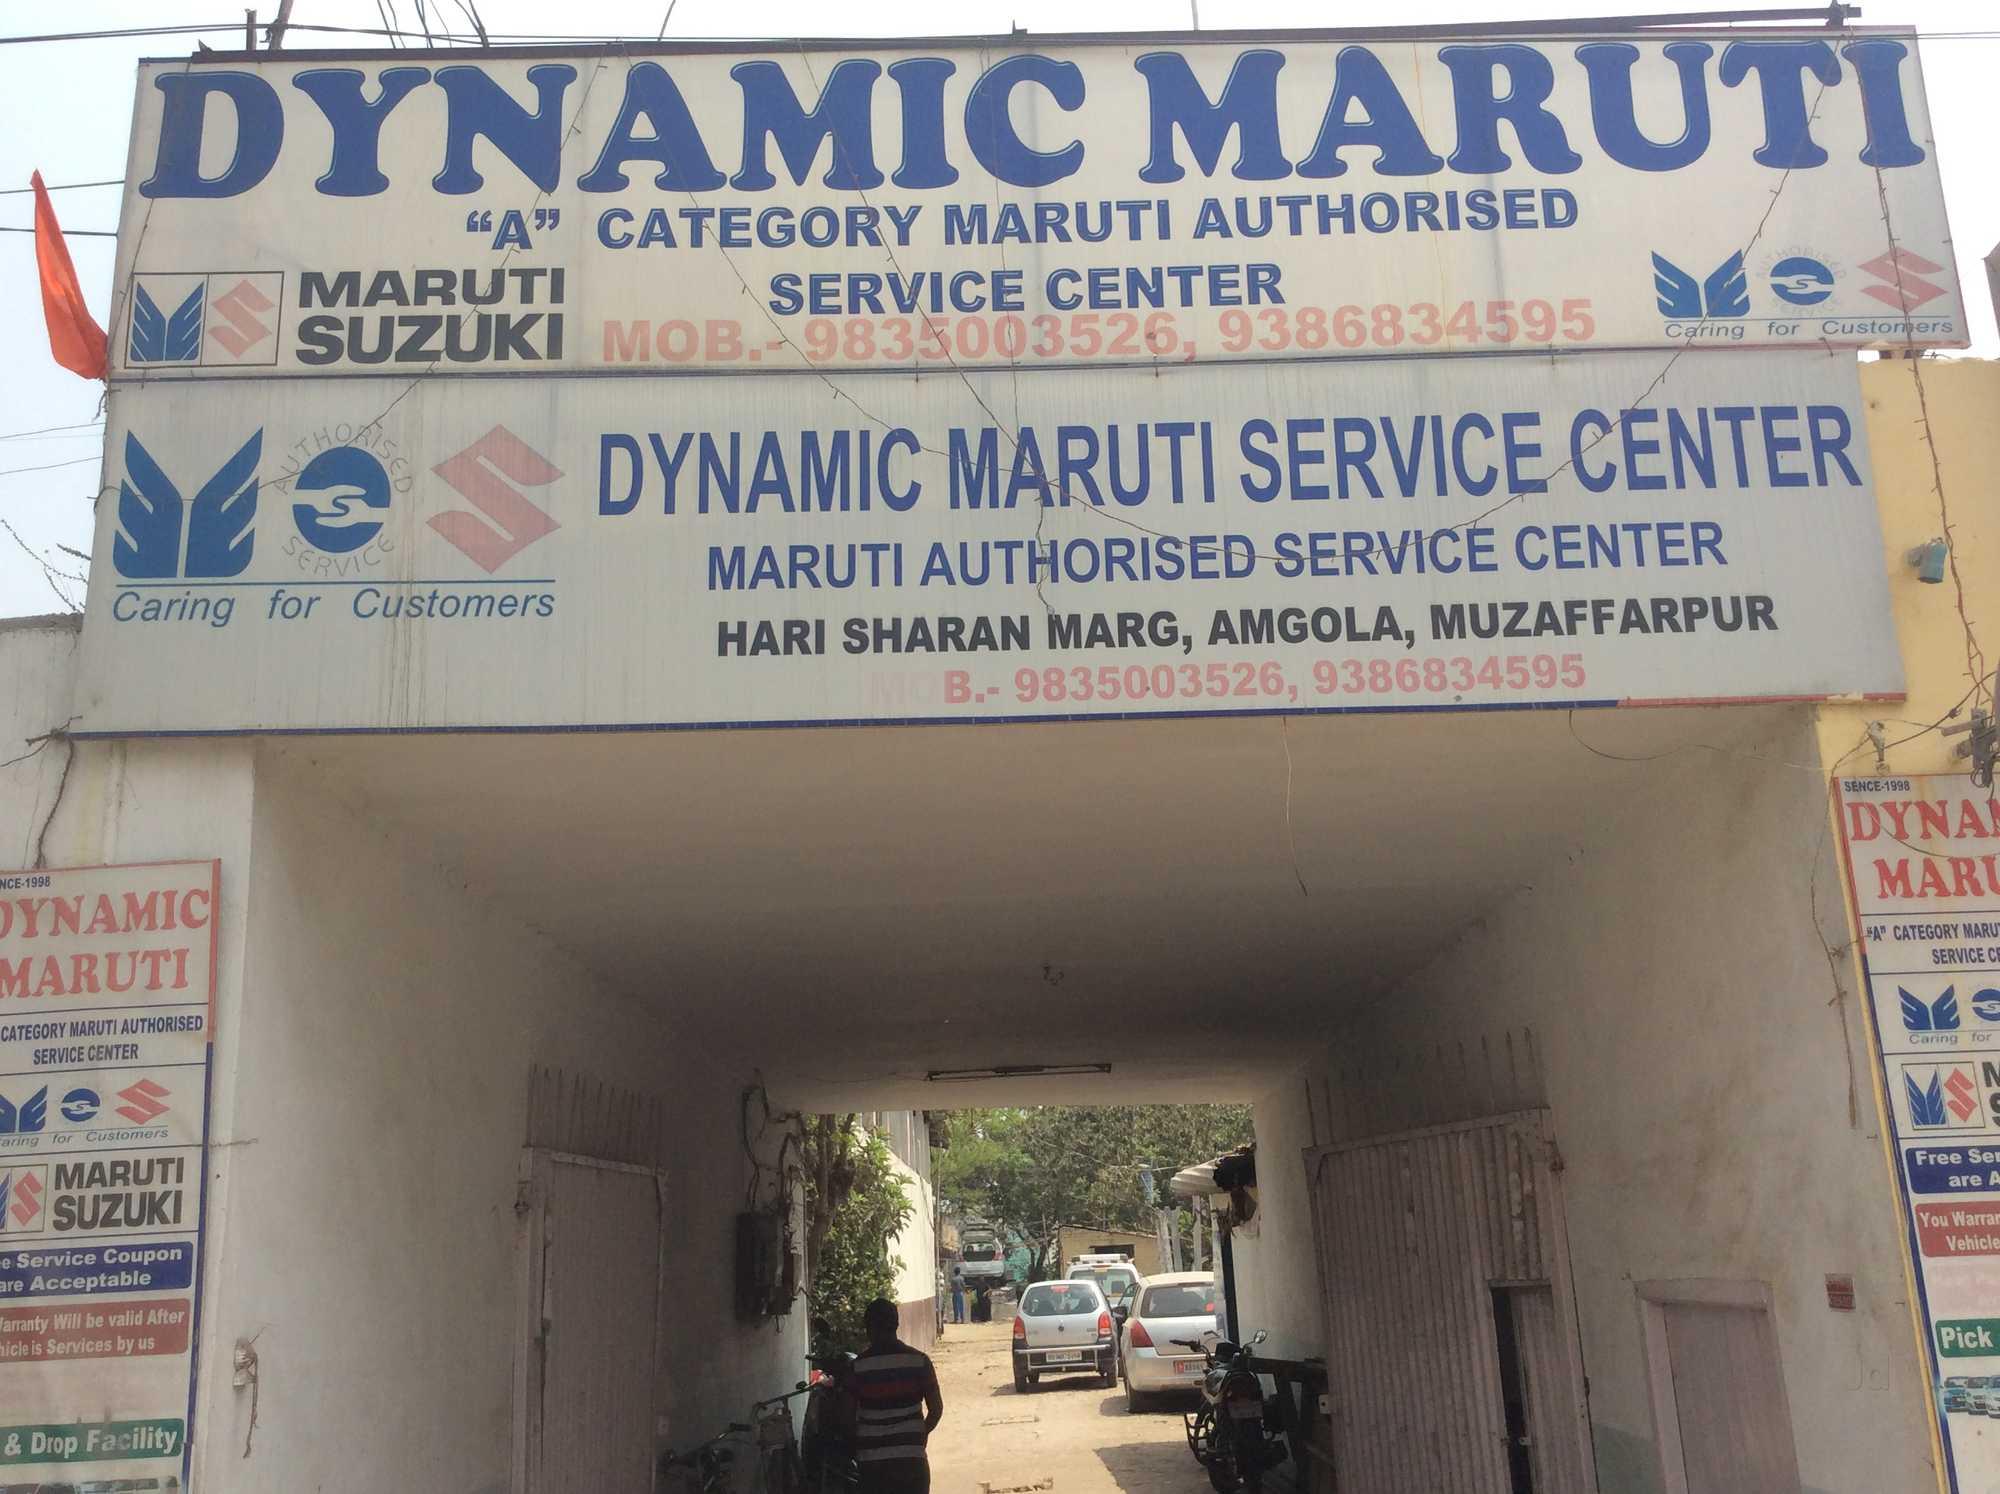 Dynamic Maruti Service Centre Amgola Car Repair Services Maruti Suzuki In Muzaffarpur Justdial